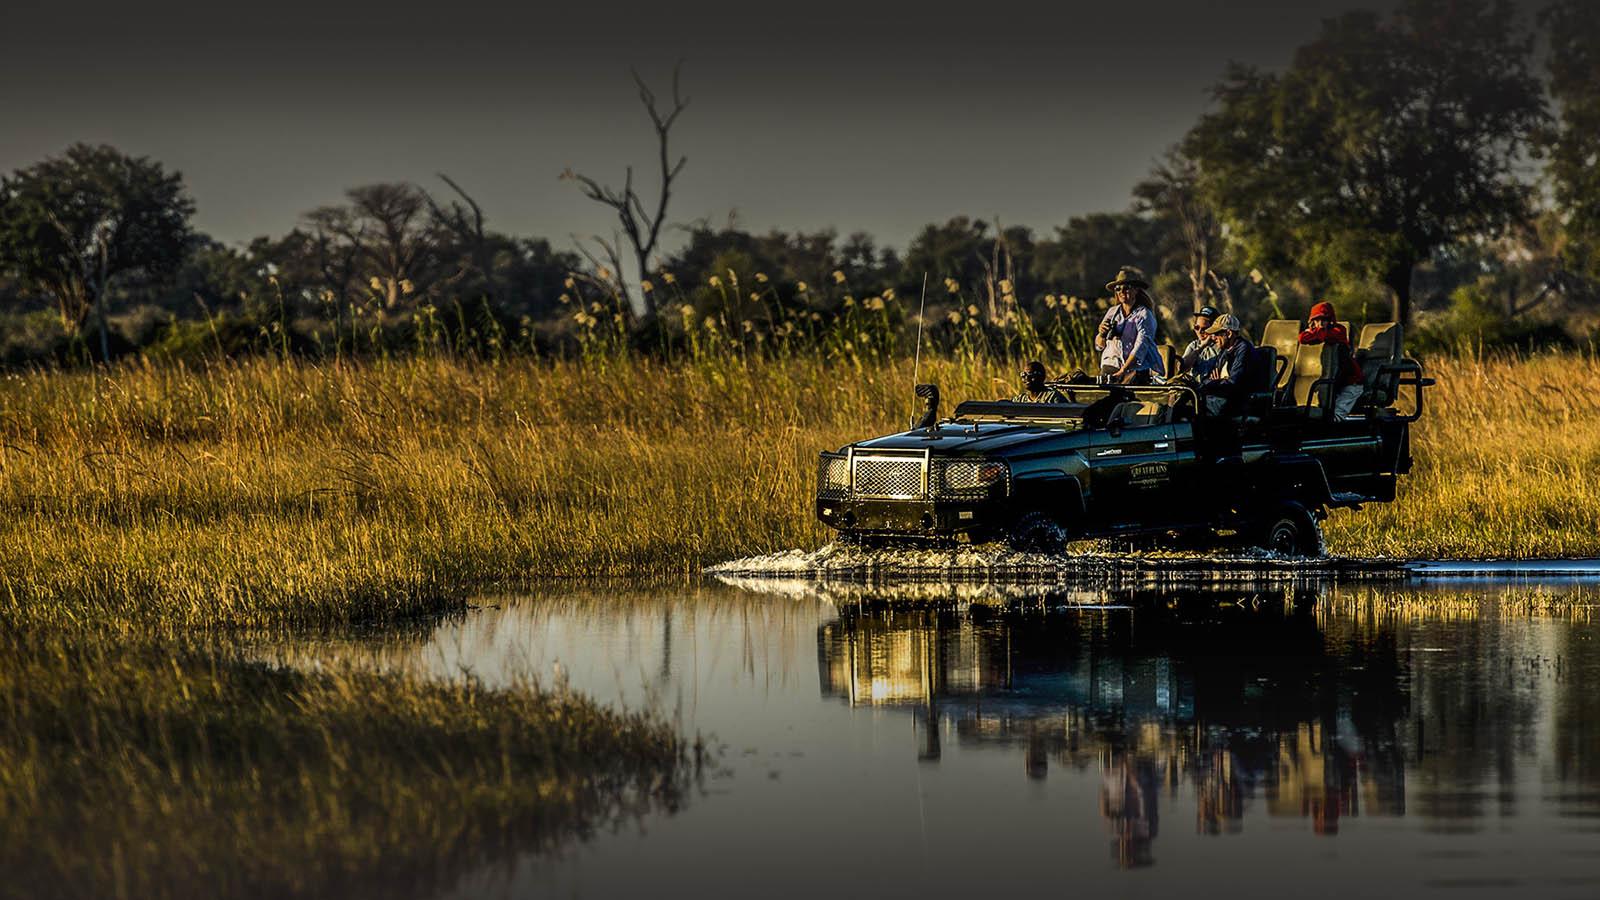 great plains duba plains camp duba-plains-suite-okavango-delta-botswana-lodges-zambia-in-style-luxury-wildlife-viewing